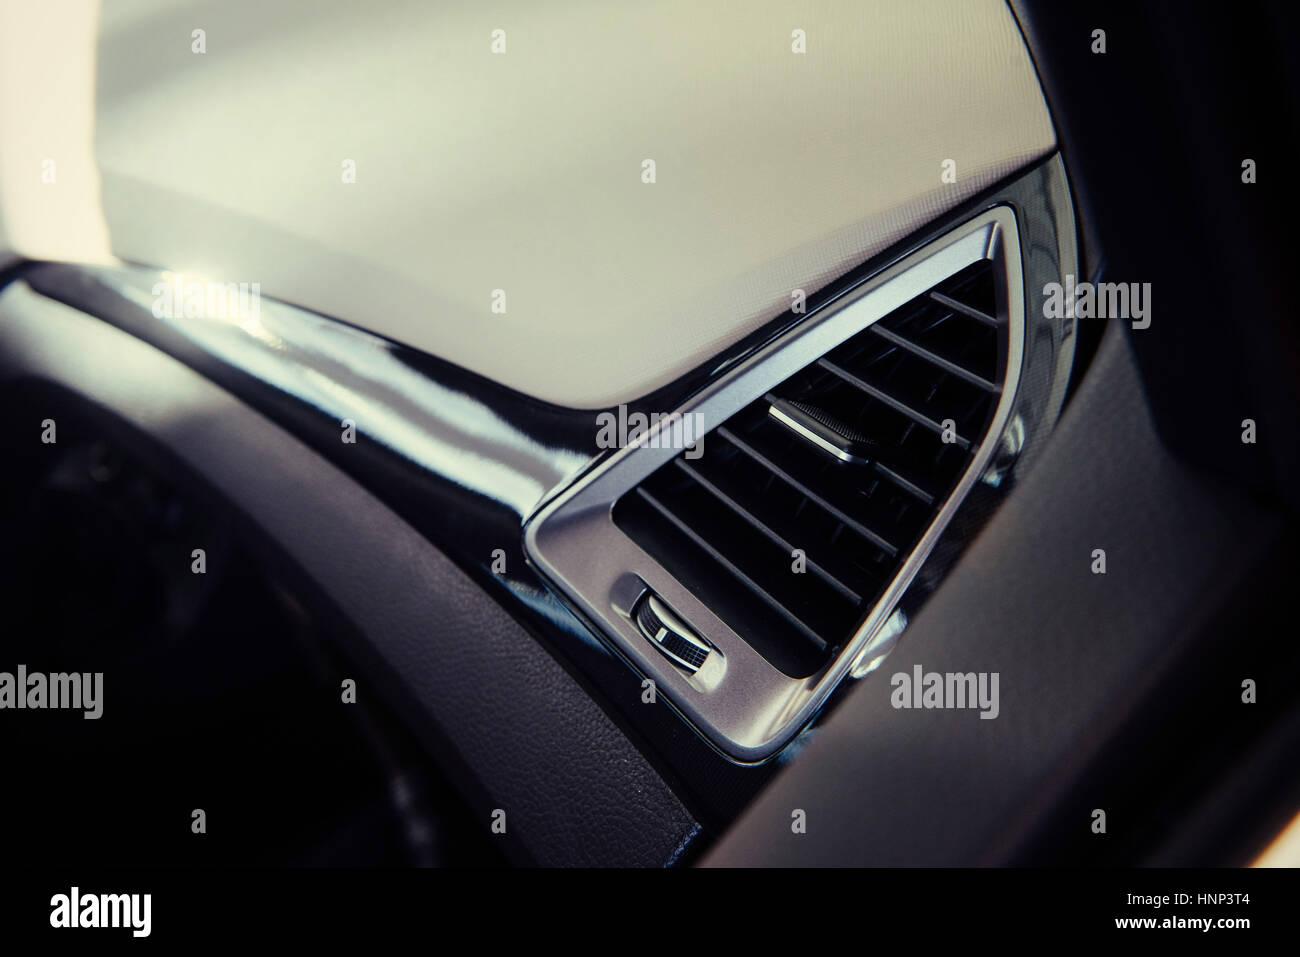 Modern car interior dashboard and steering wheel. - Stock Image